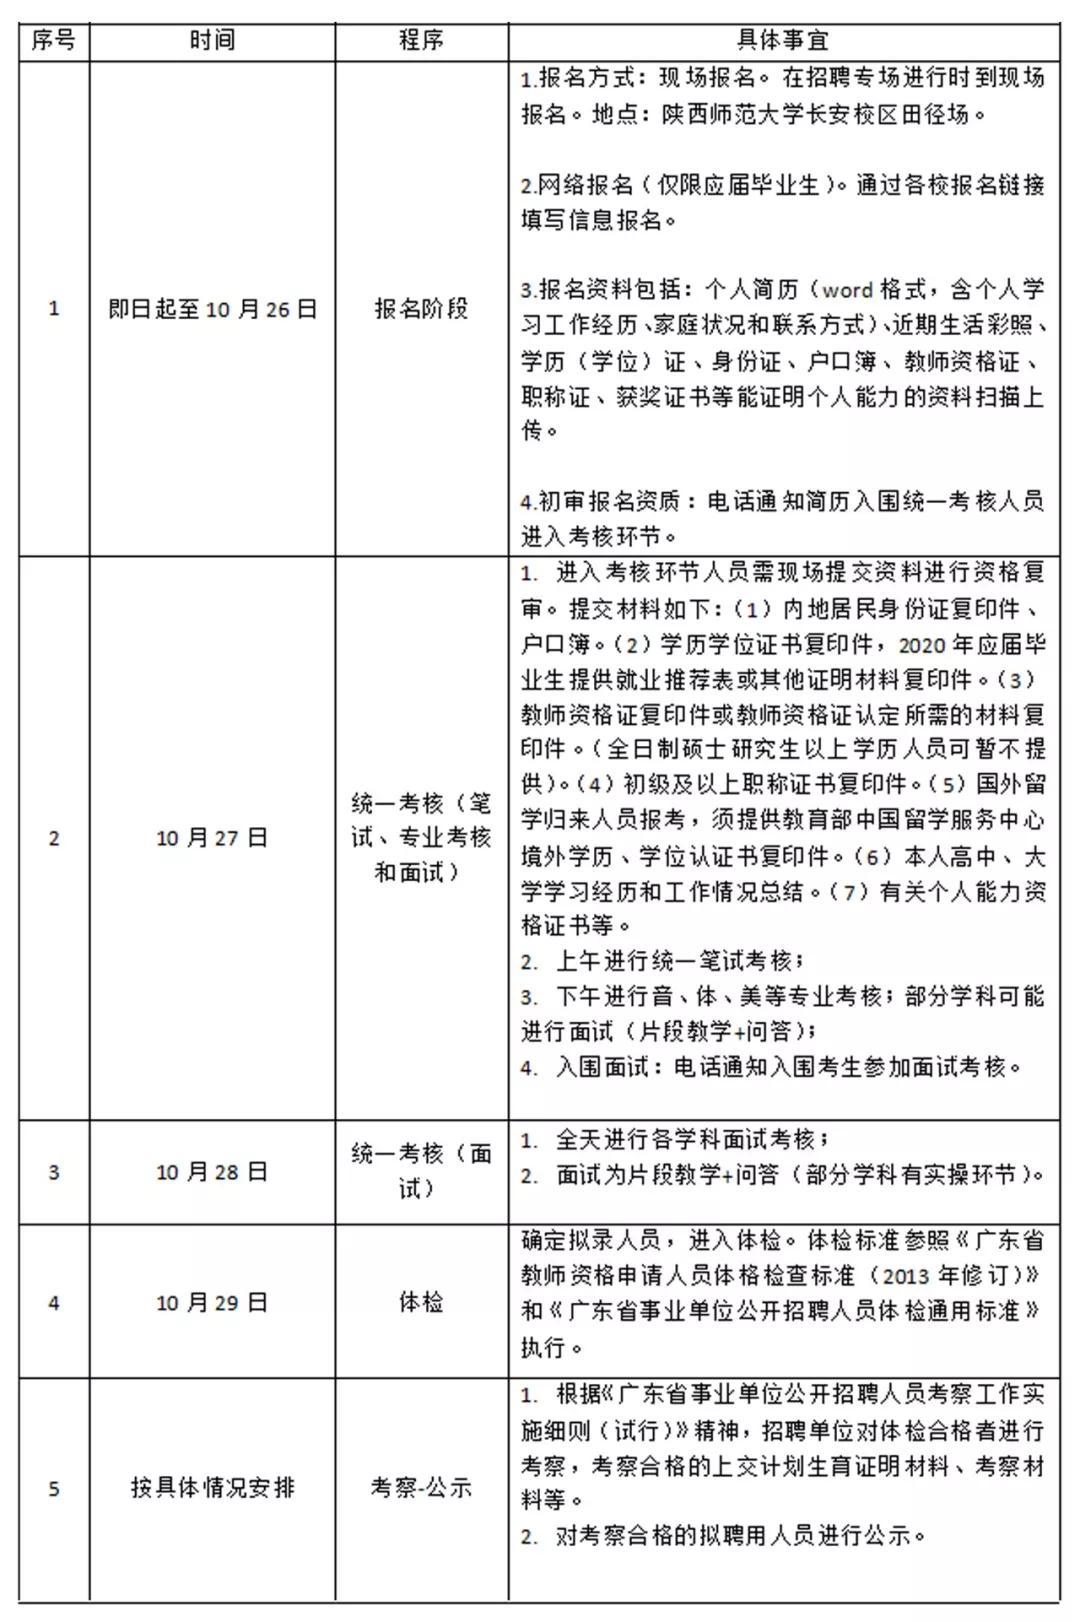 http://www.omcr.icu/wenhuayichan/143320.html